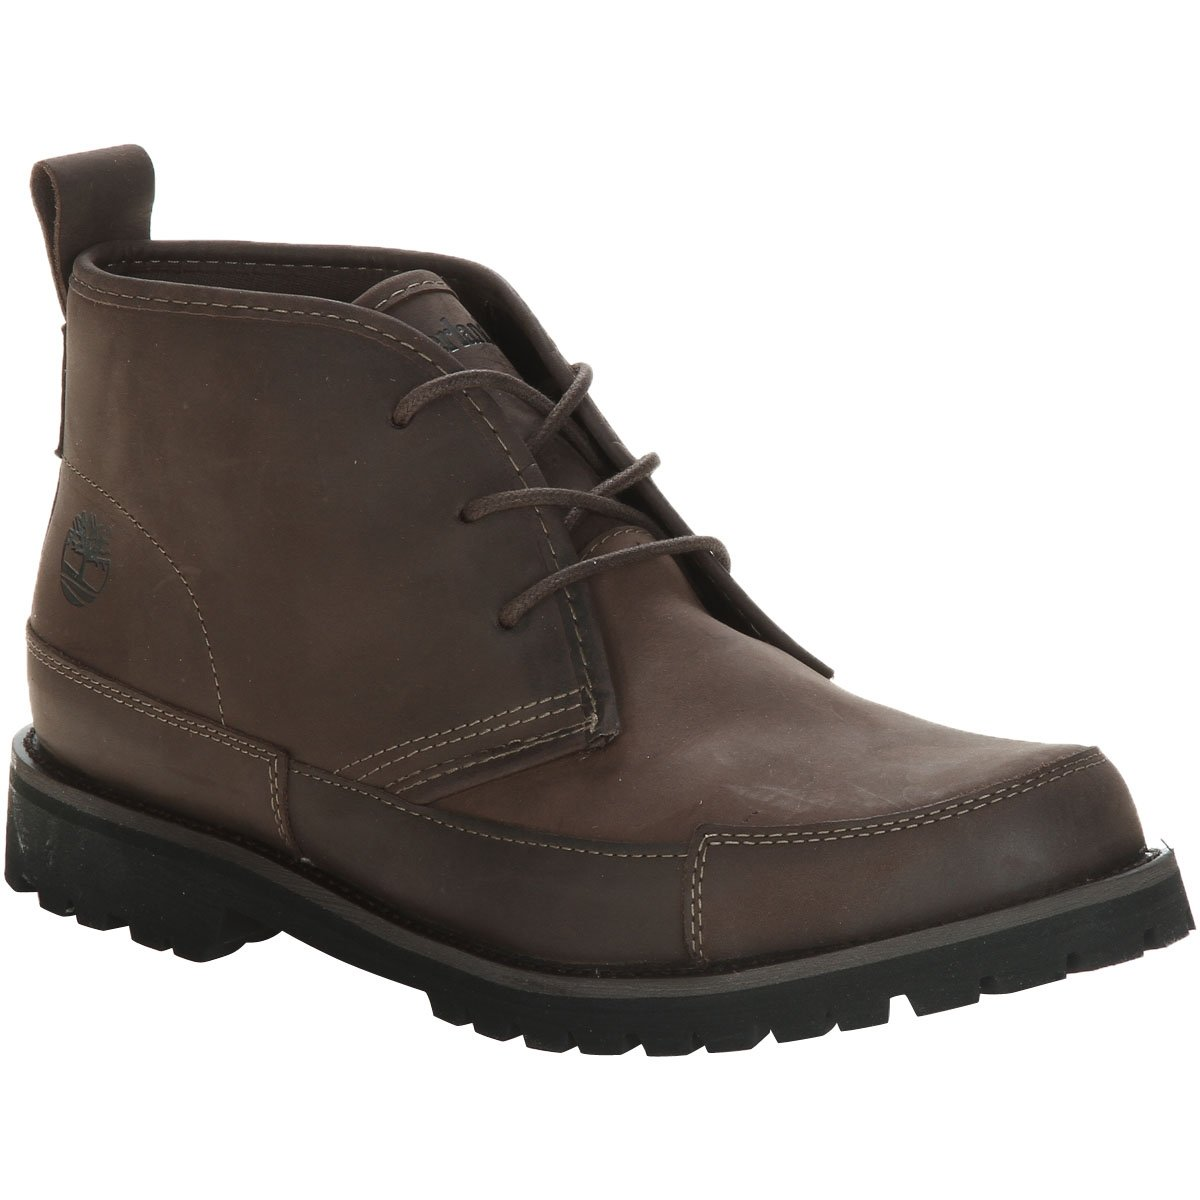 4a5672a9c Bota Timberland Ek Leather Chukka Brown - Compre Agora